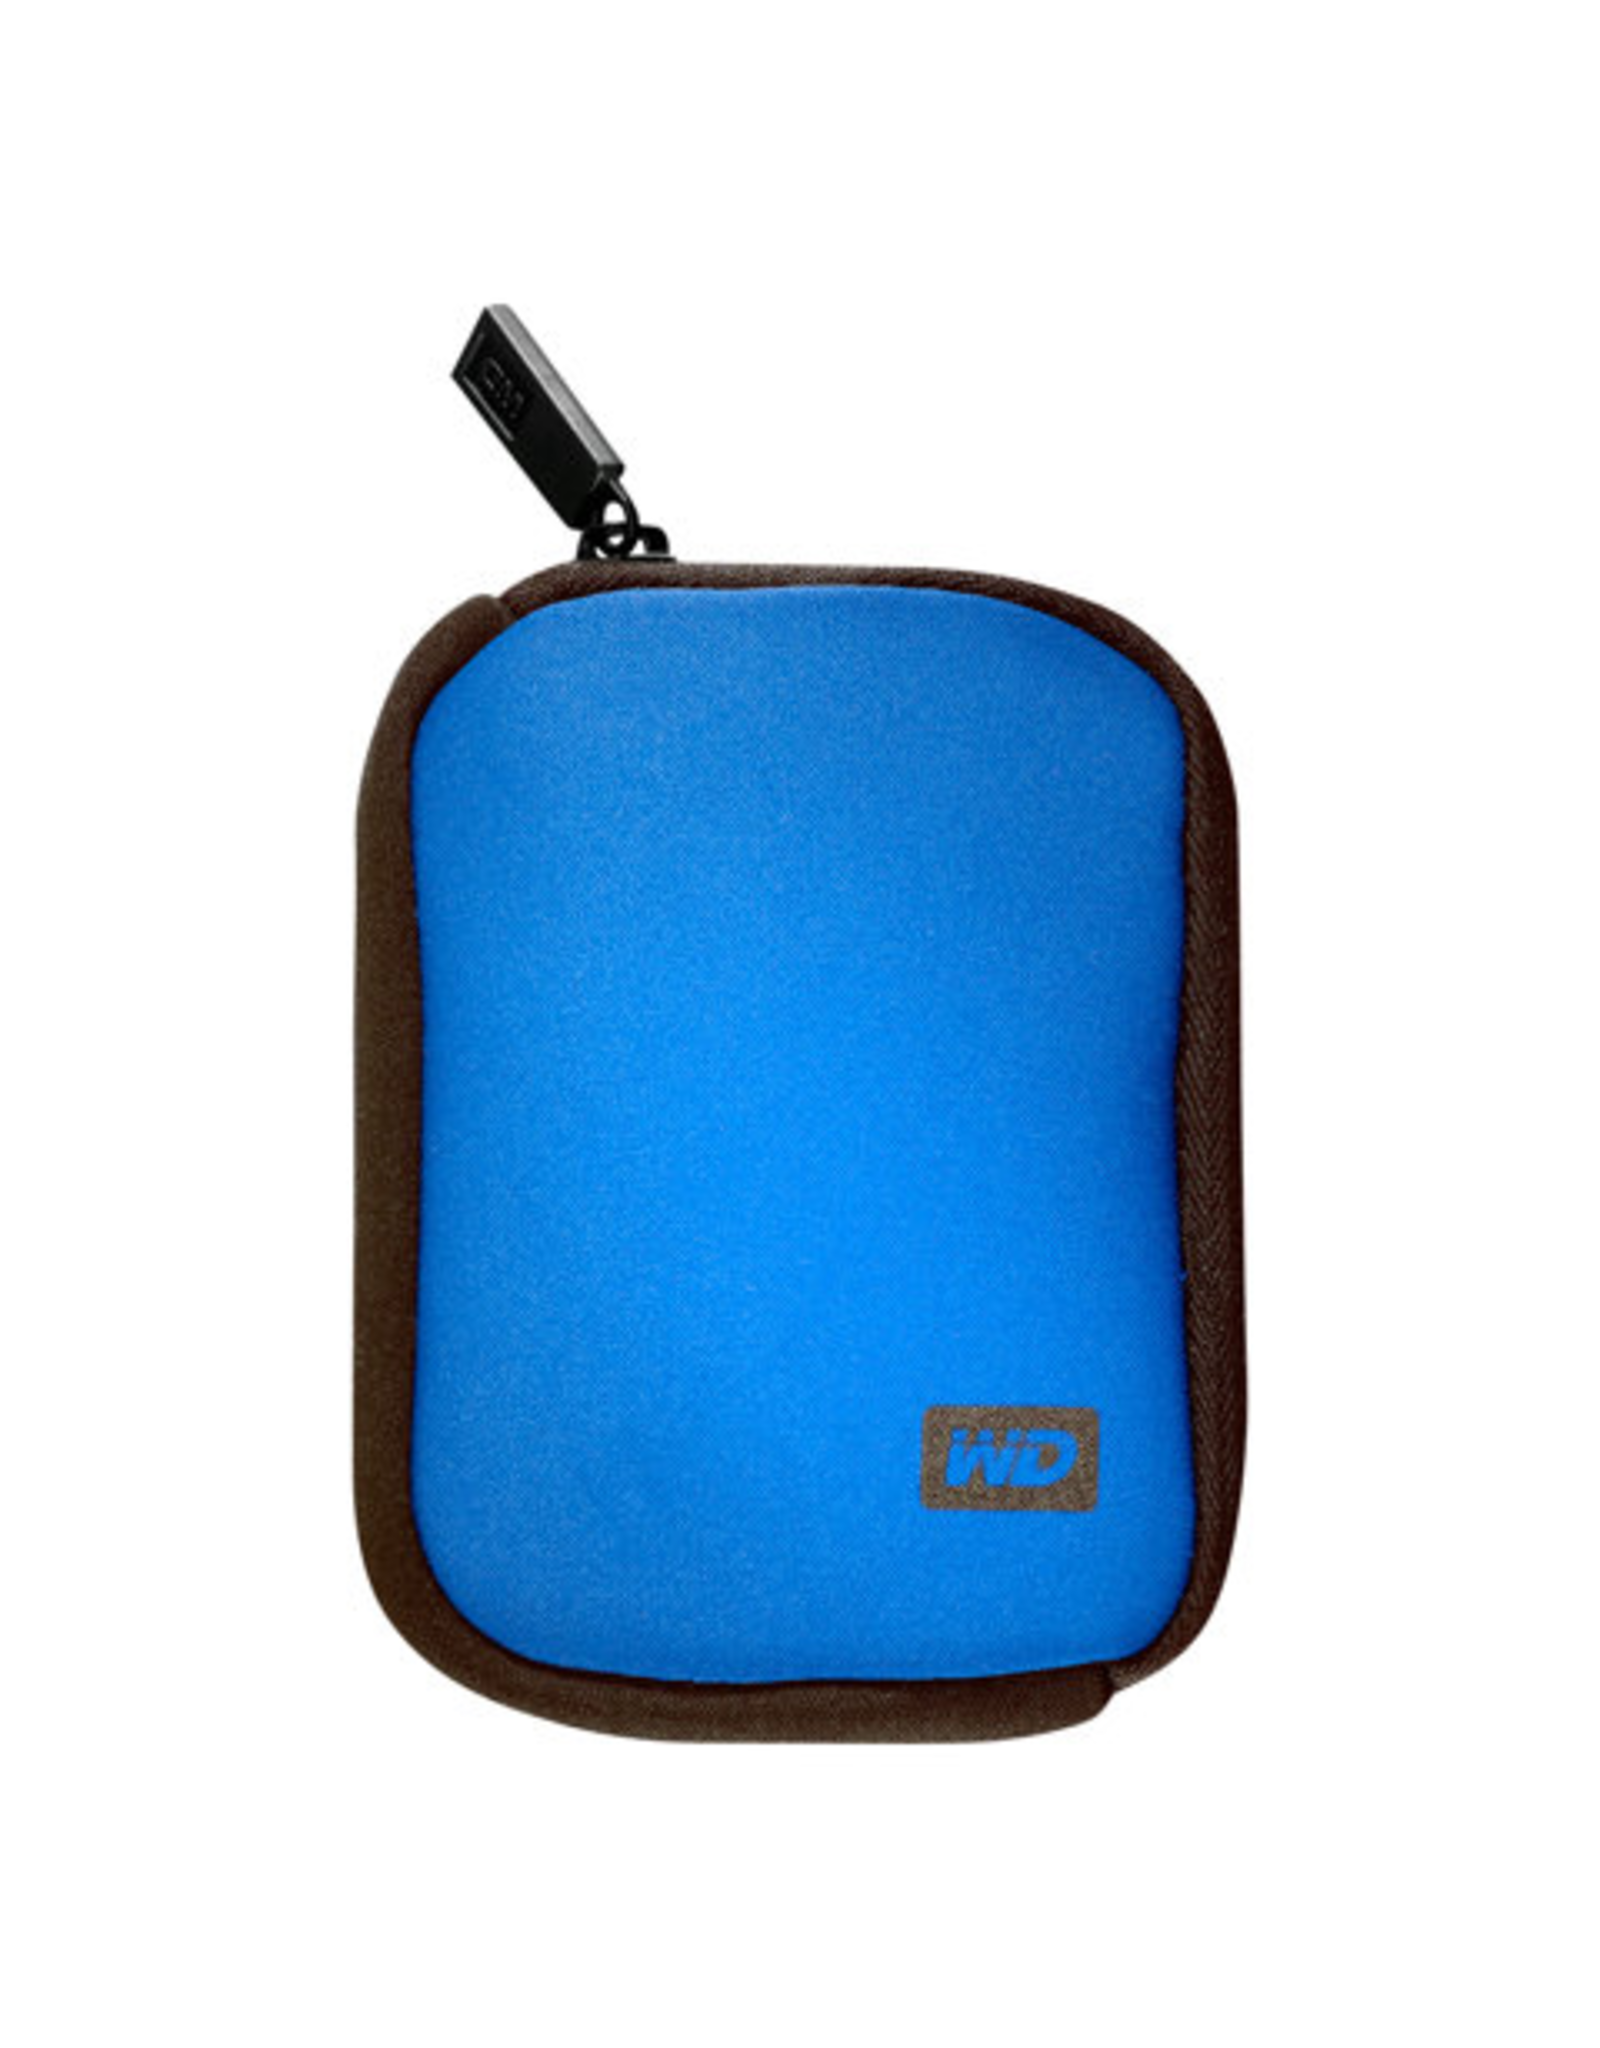 Western Digital WD My Passport Carrying Case Blue